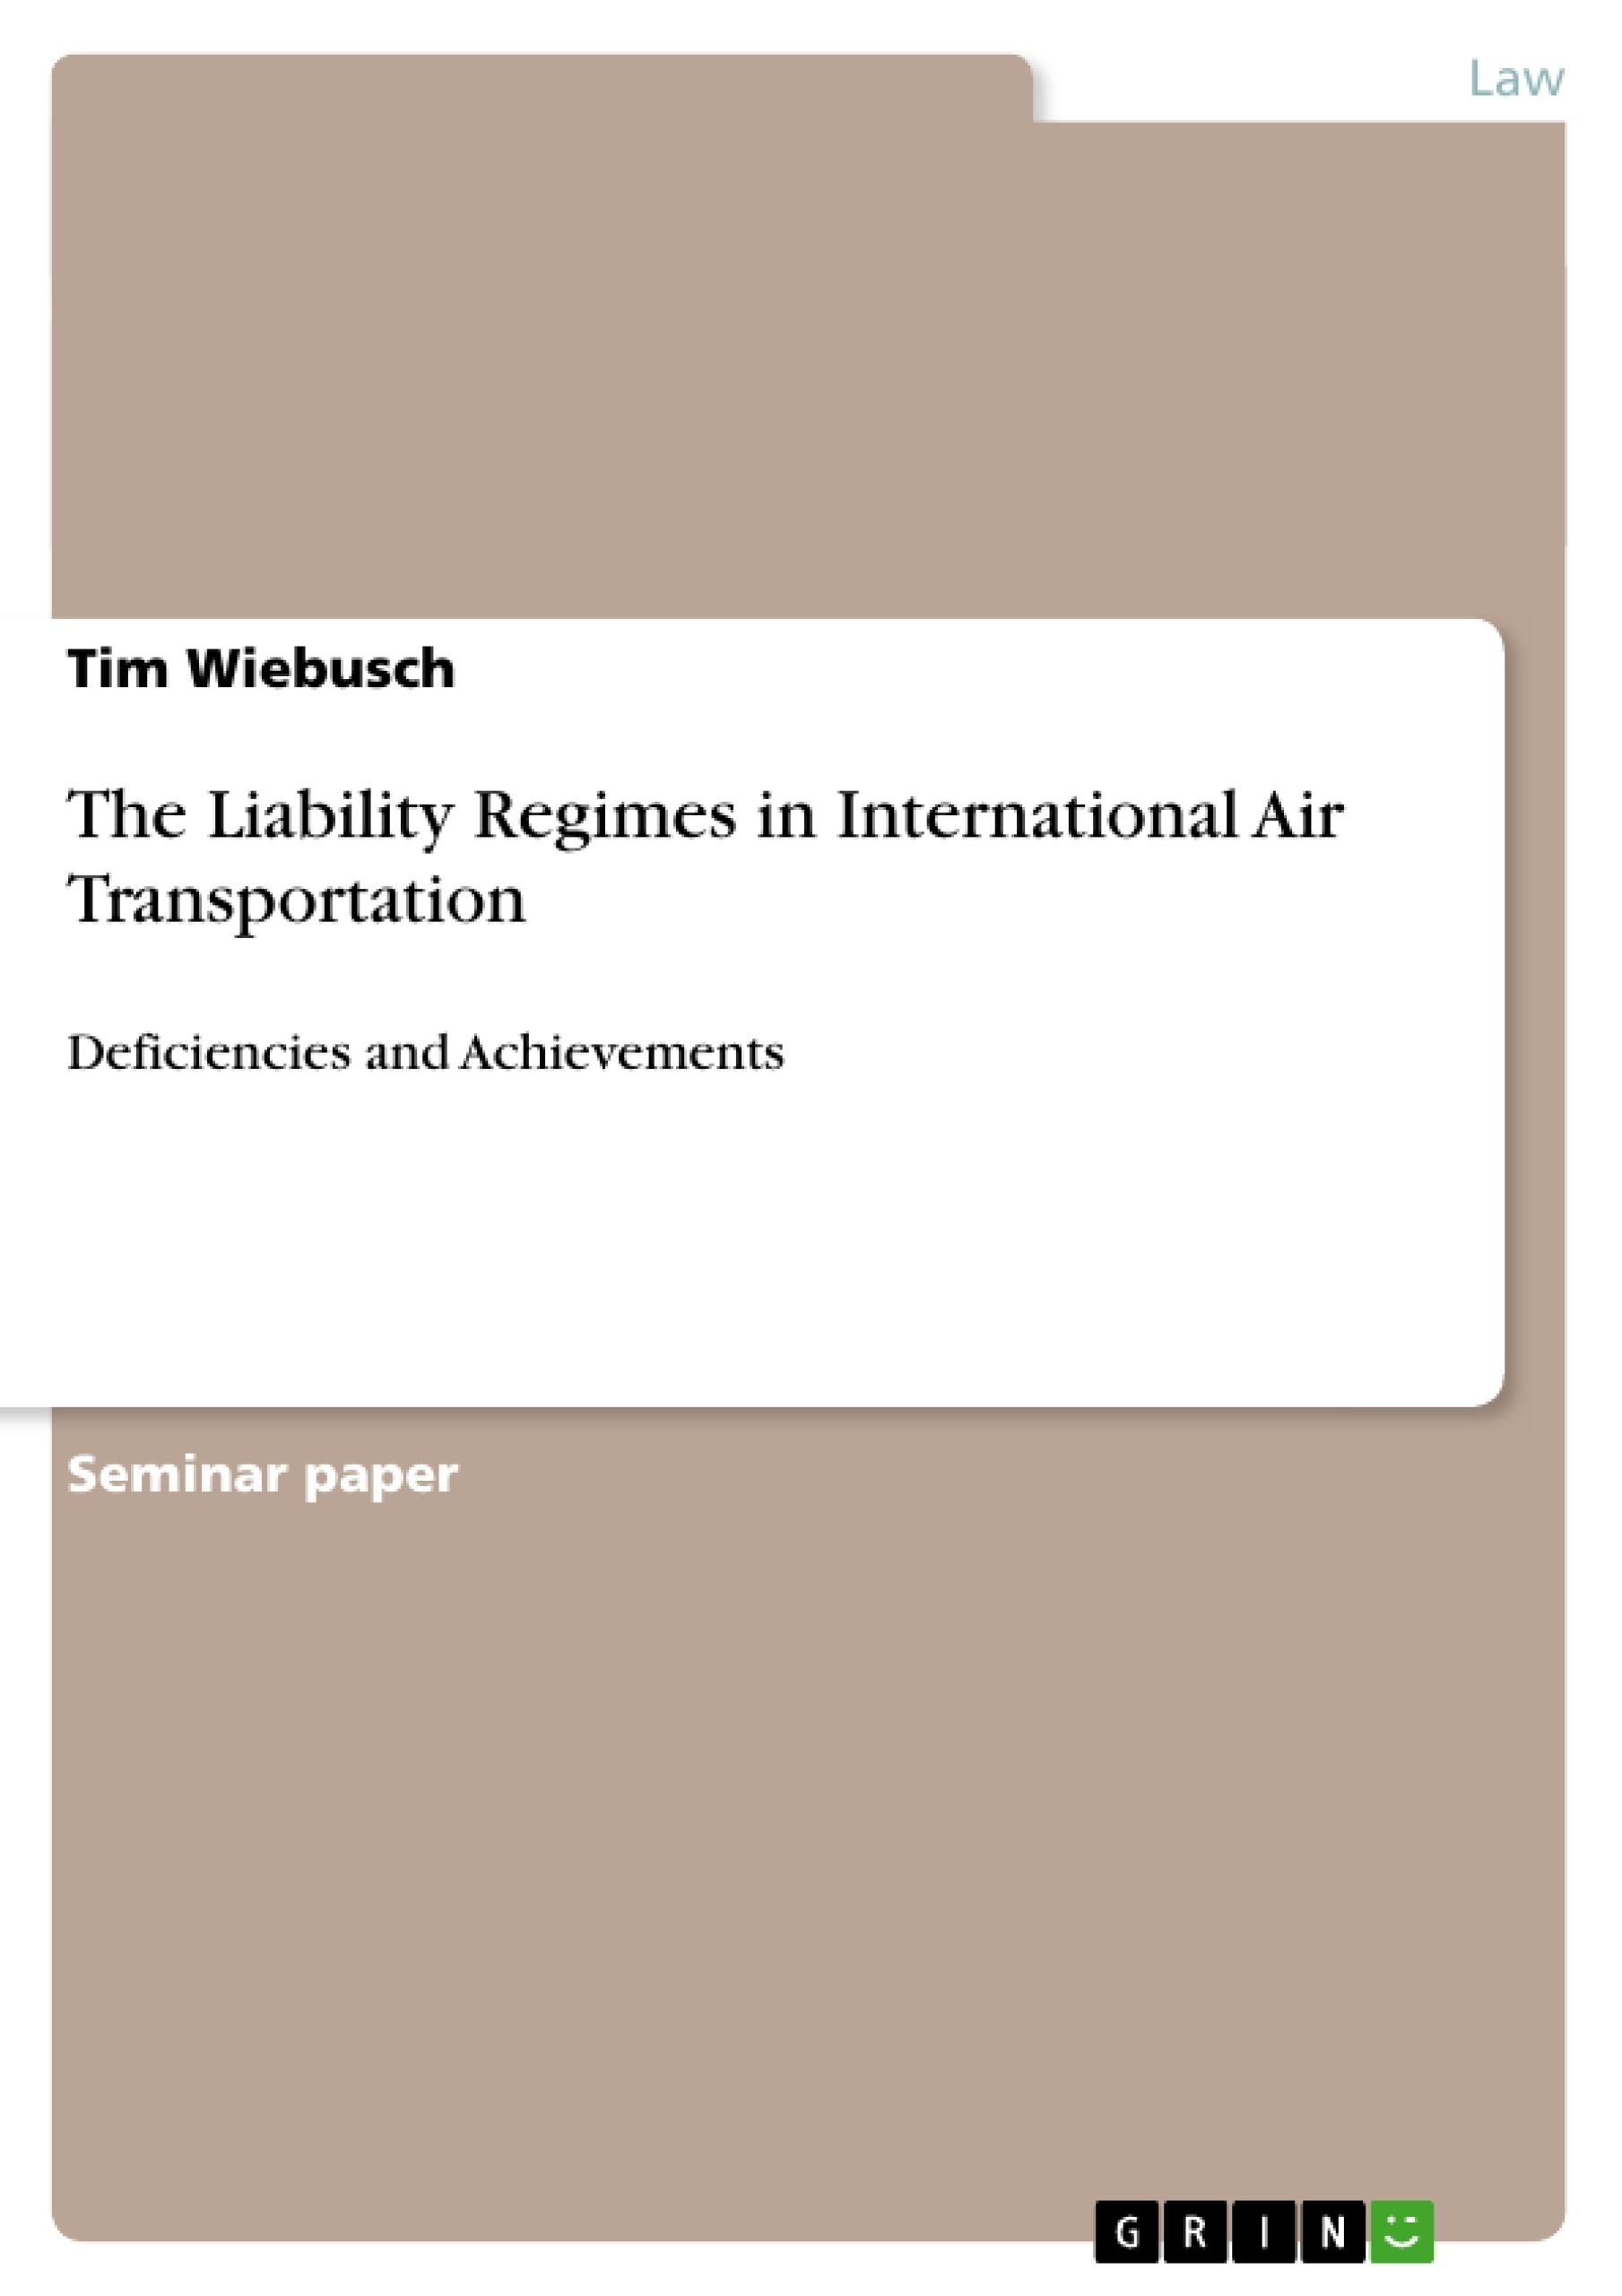 Title: The Liability Regimes in International Air Transportation